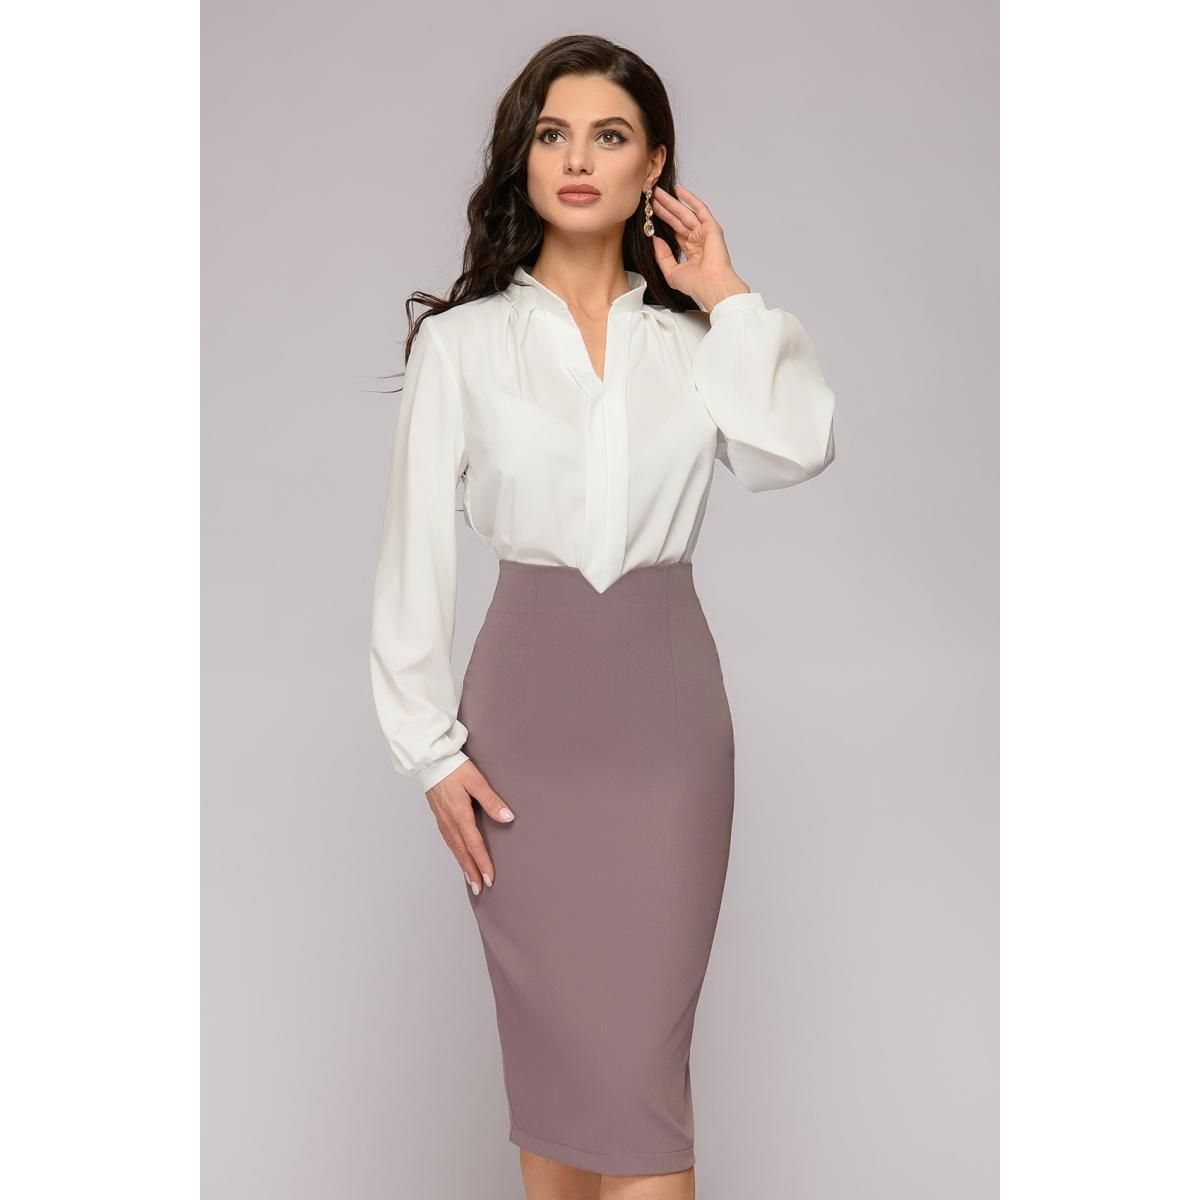 Юбка-карандаш цвета мокко | Дизайн блузки